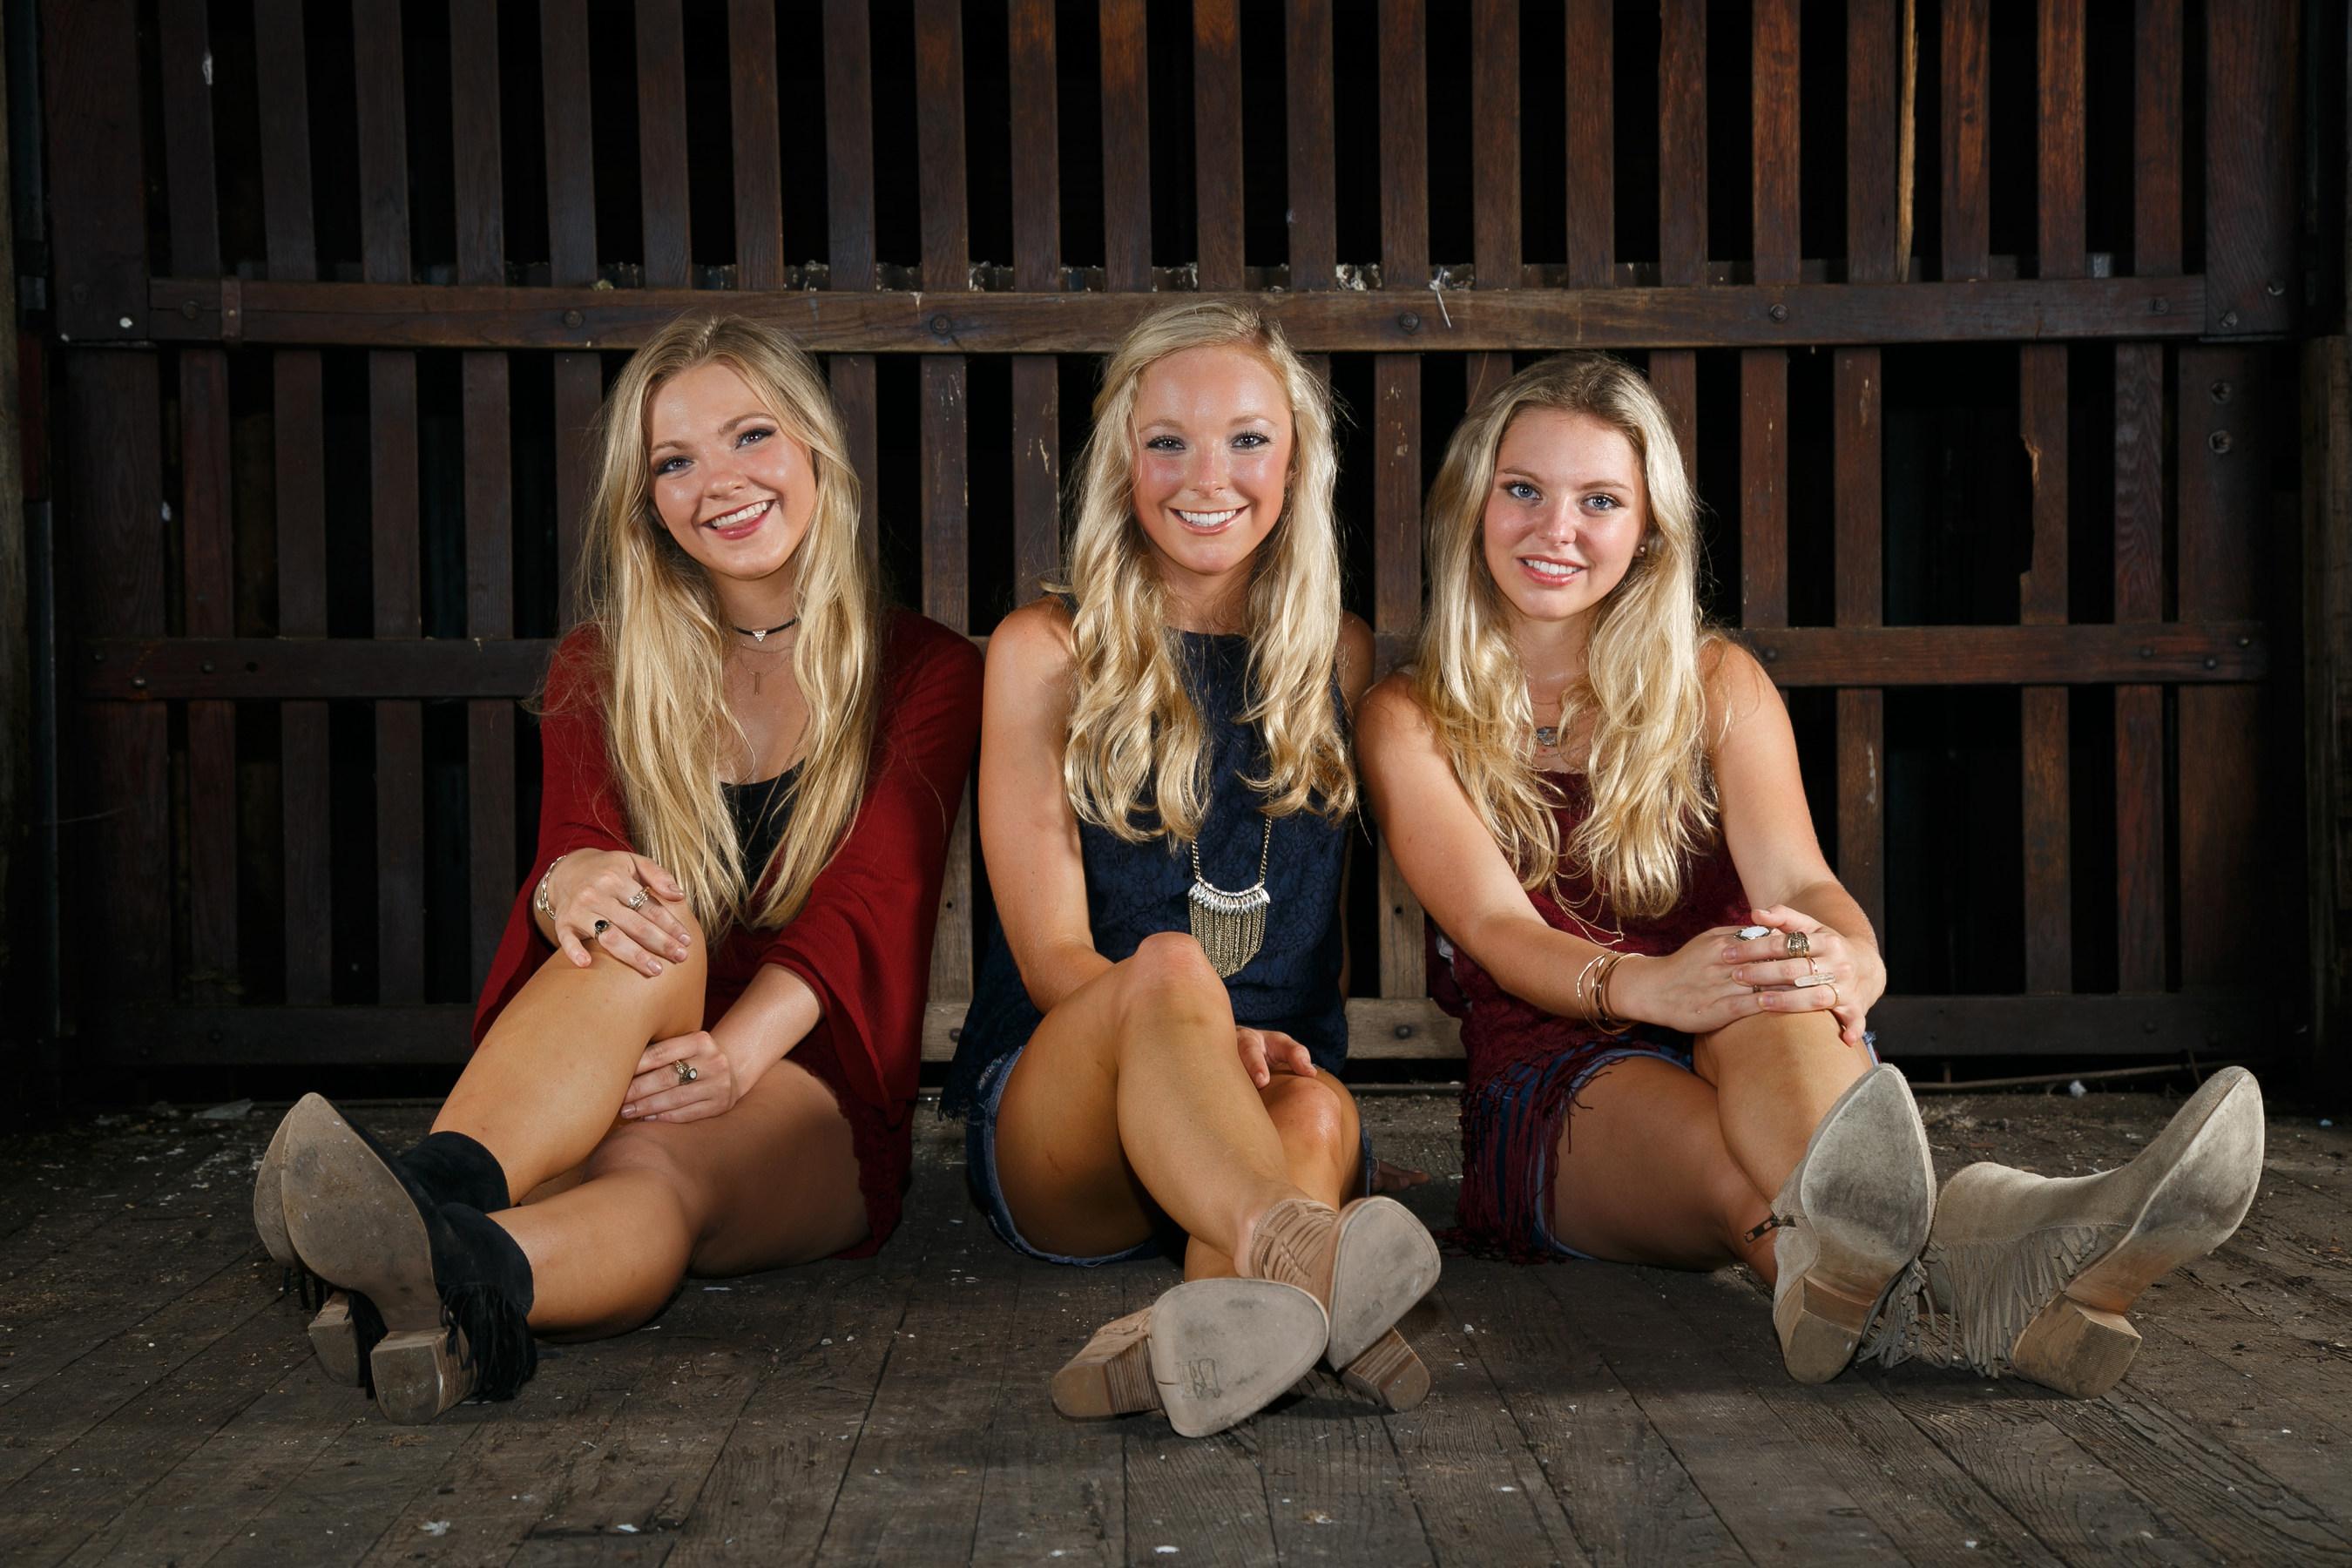 Southern Halo - Christina, Natalia and Hannah. Photo credit: Austin Britt (PRNewsFoto/Southern Halo)